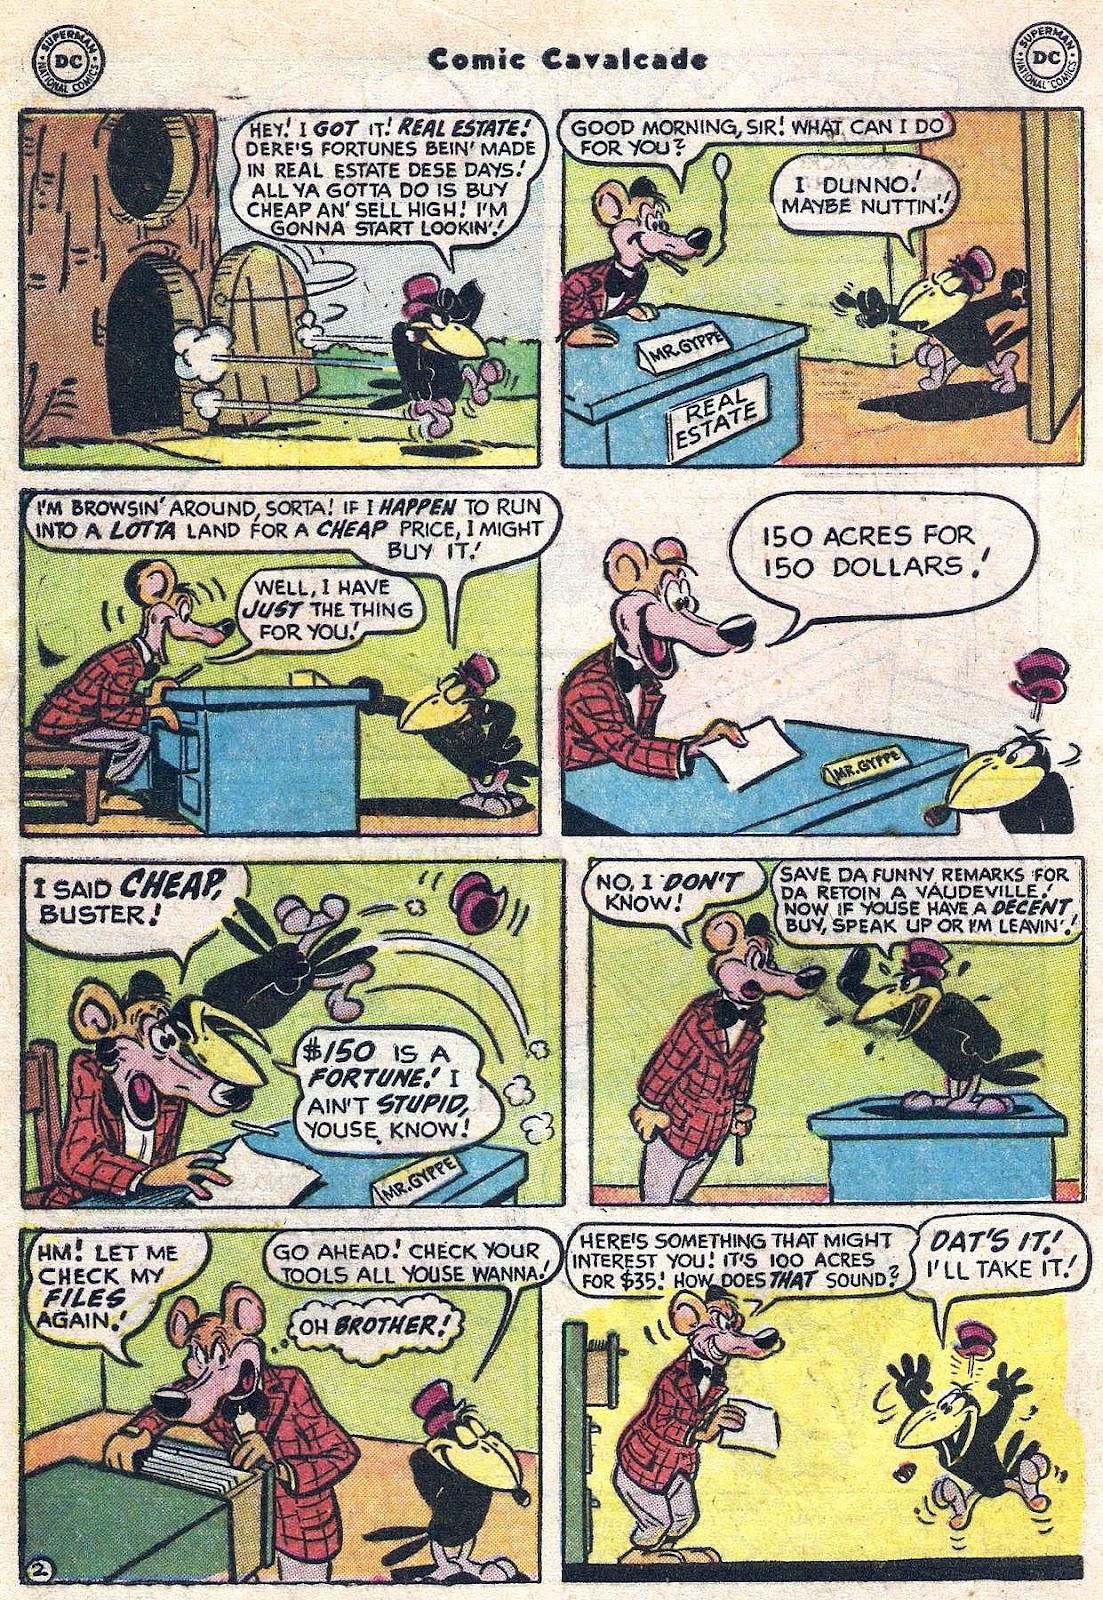 Comic Cavalcade issue 56 - Page 4